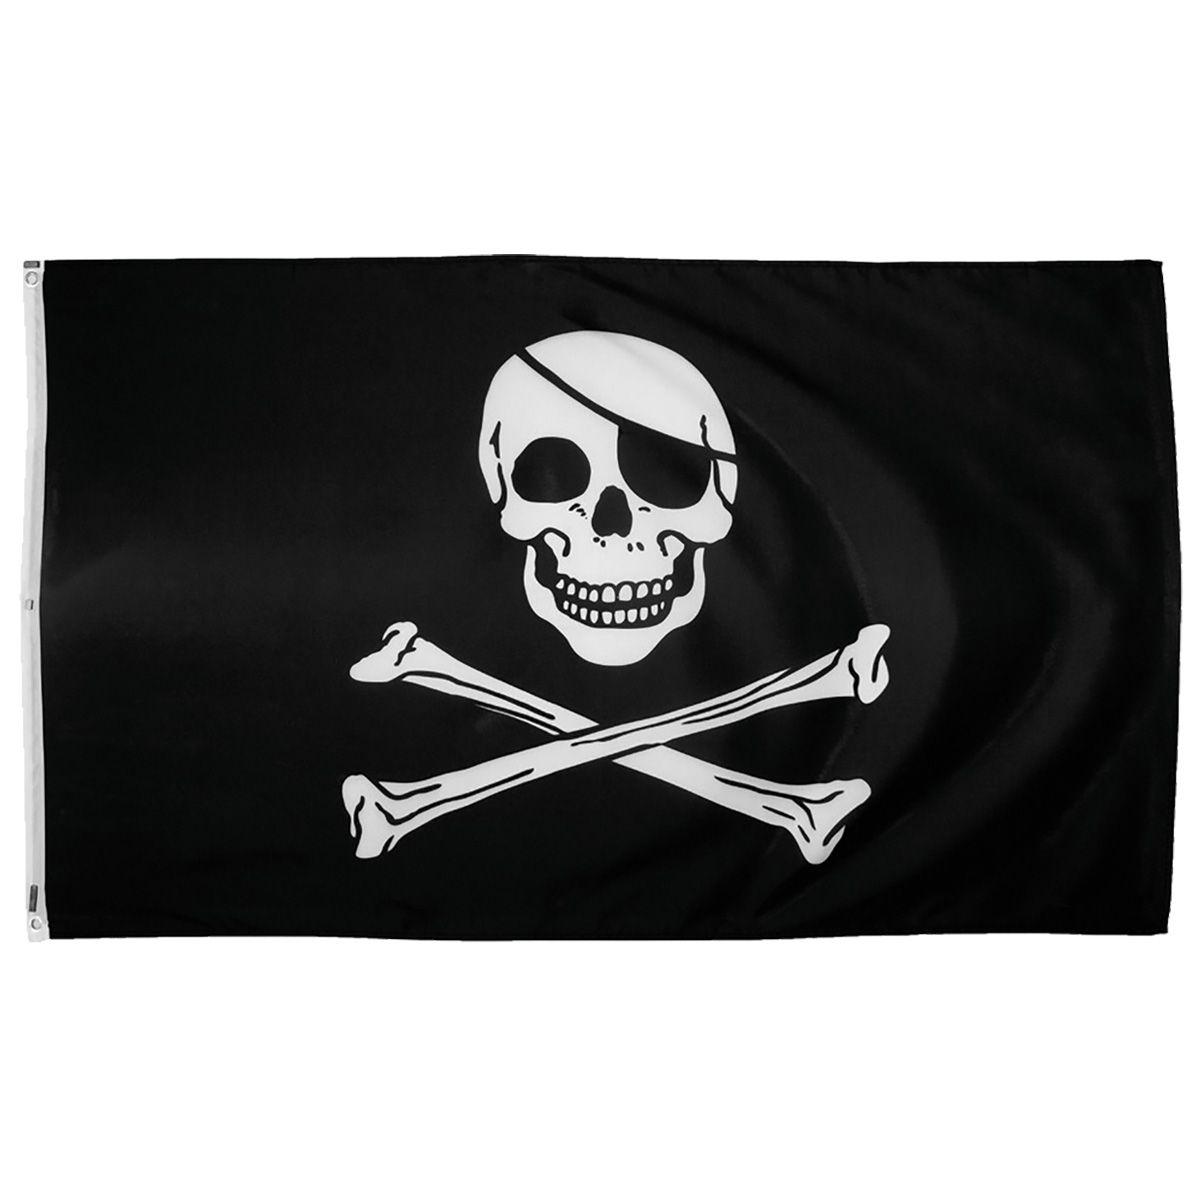 drapeau tte de mort pirate big - Tte De Mort Pirate